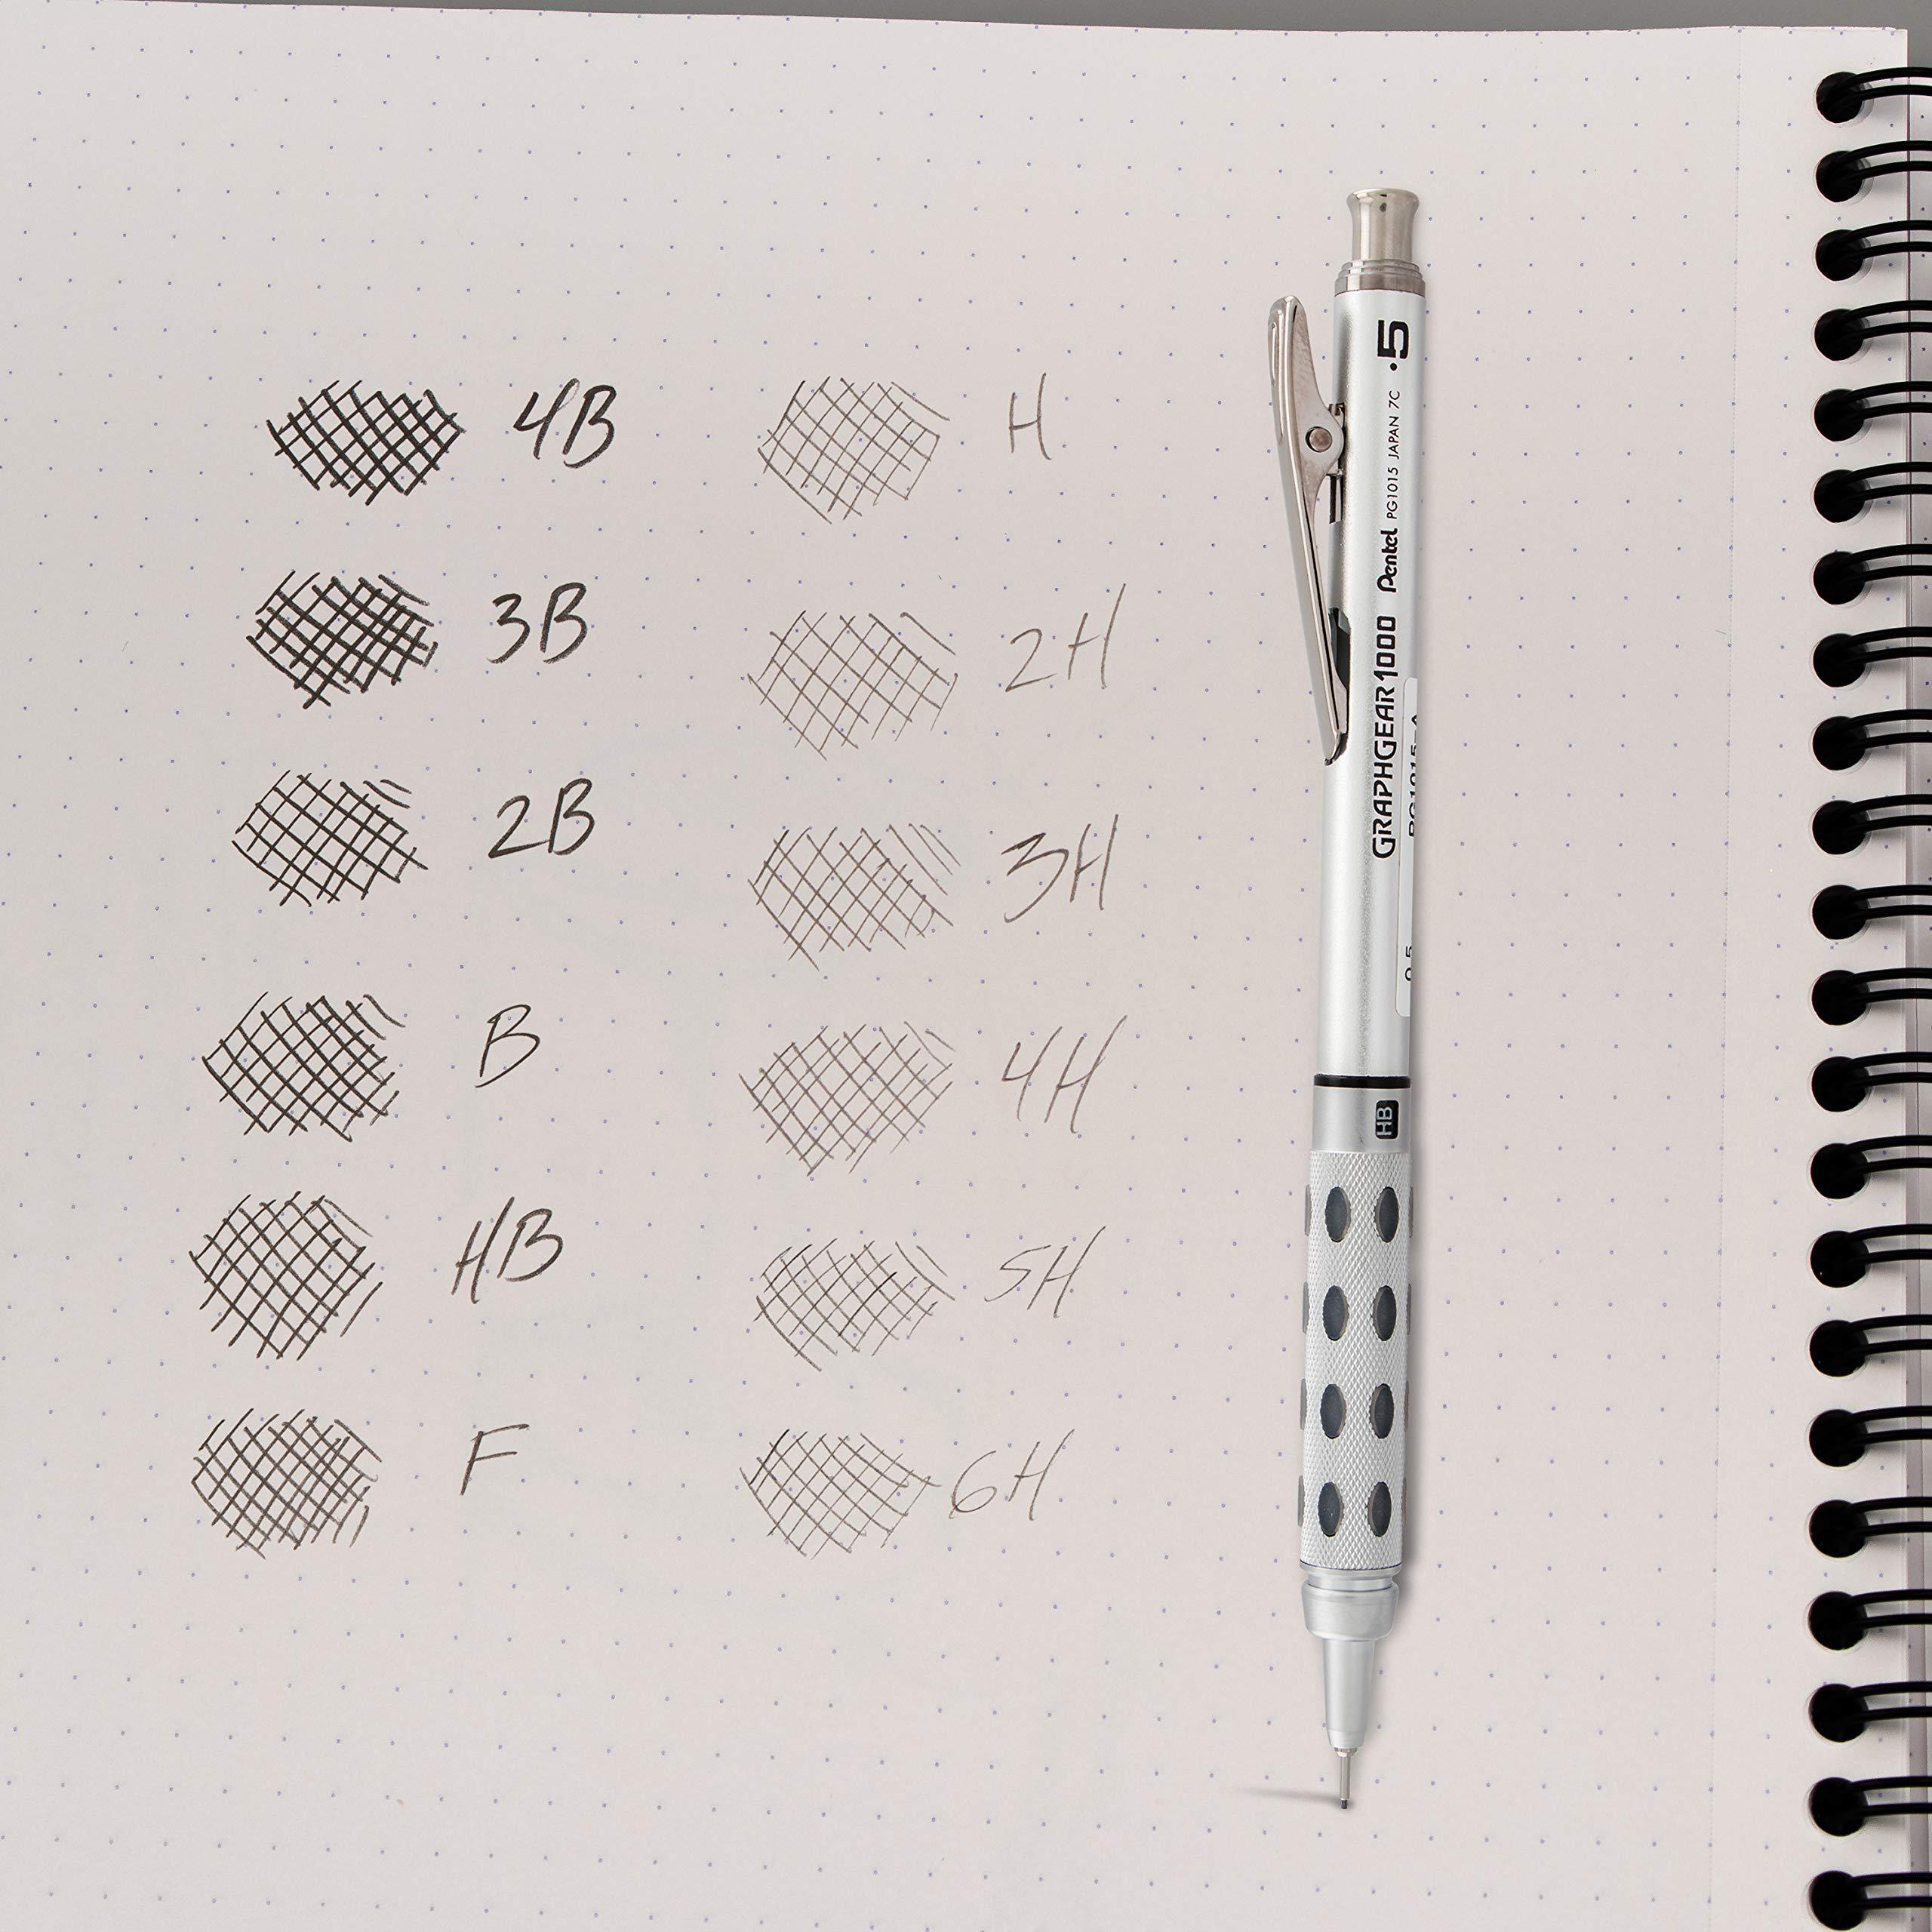 Pentel Super Hi-Polymer Lead Refill, 0.5mm, Fine, 2B, 144 Pieces of Lead (C505-2B) by Pentel (Image #7)